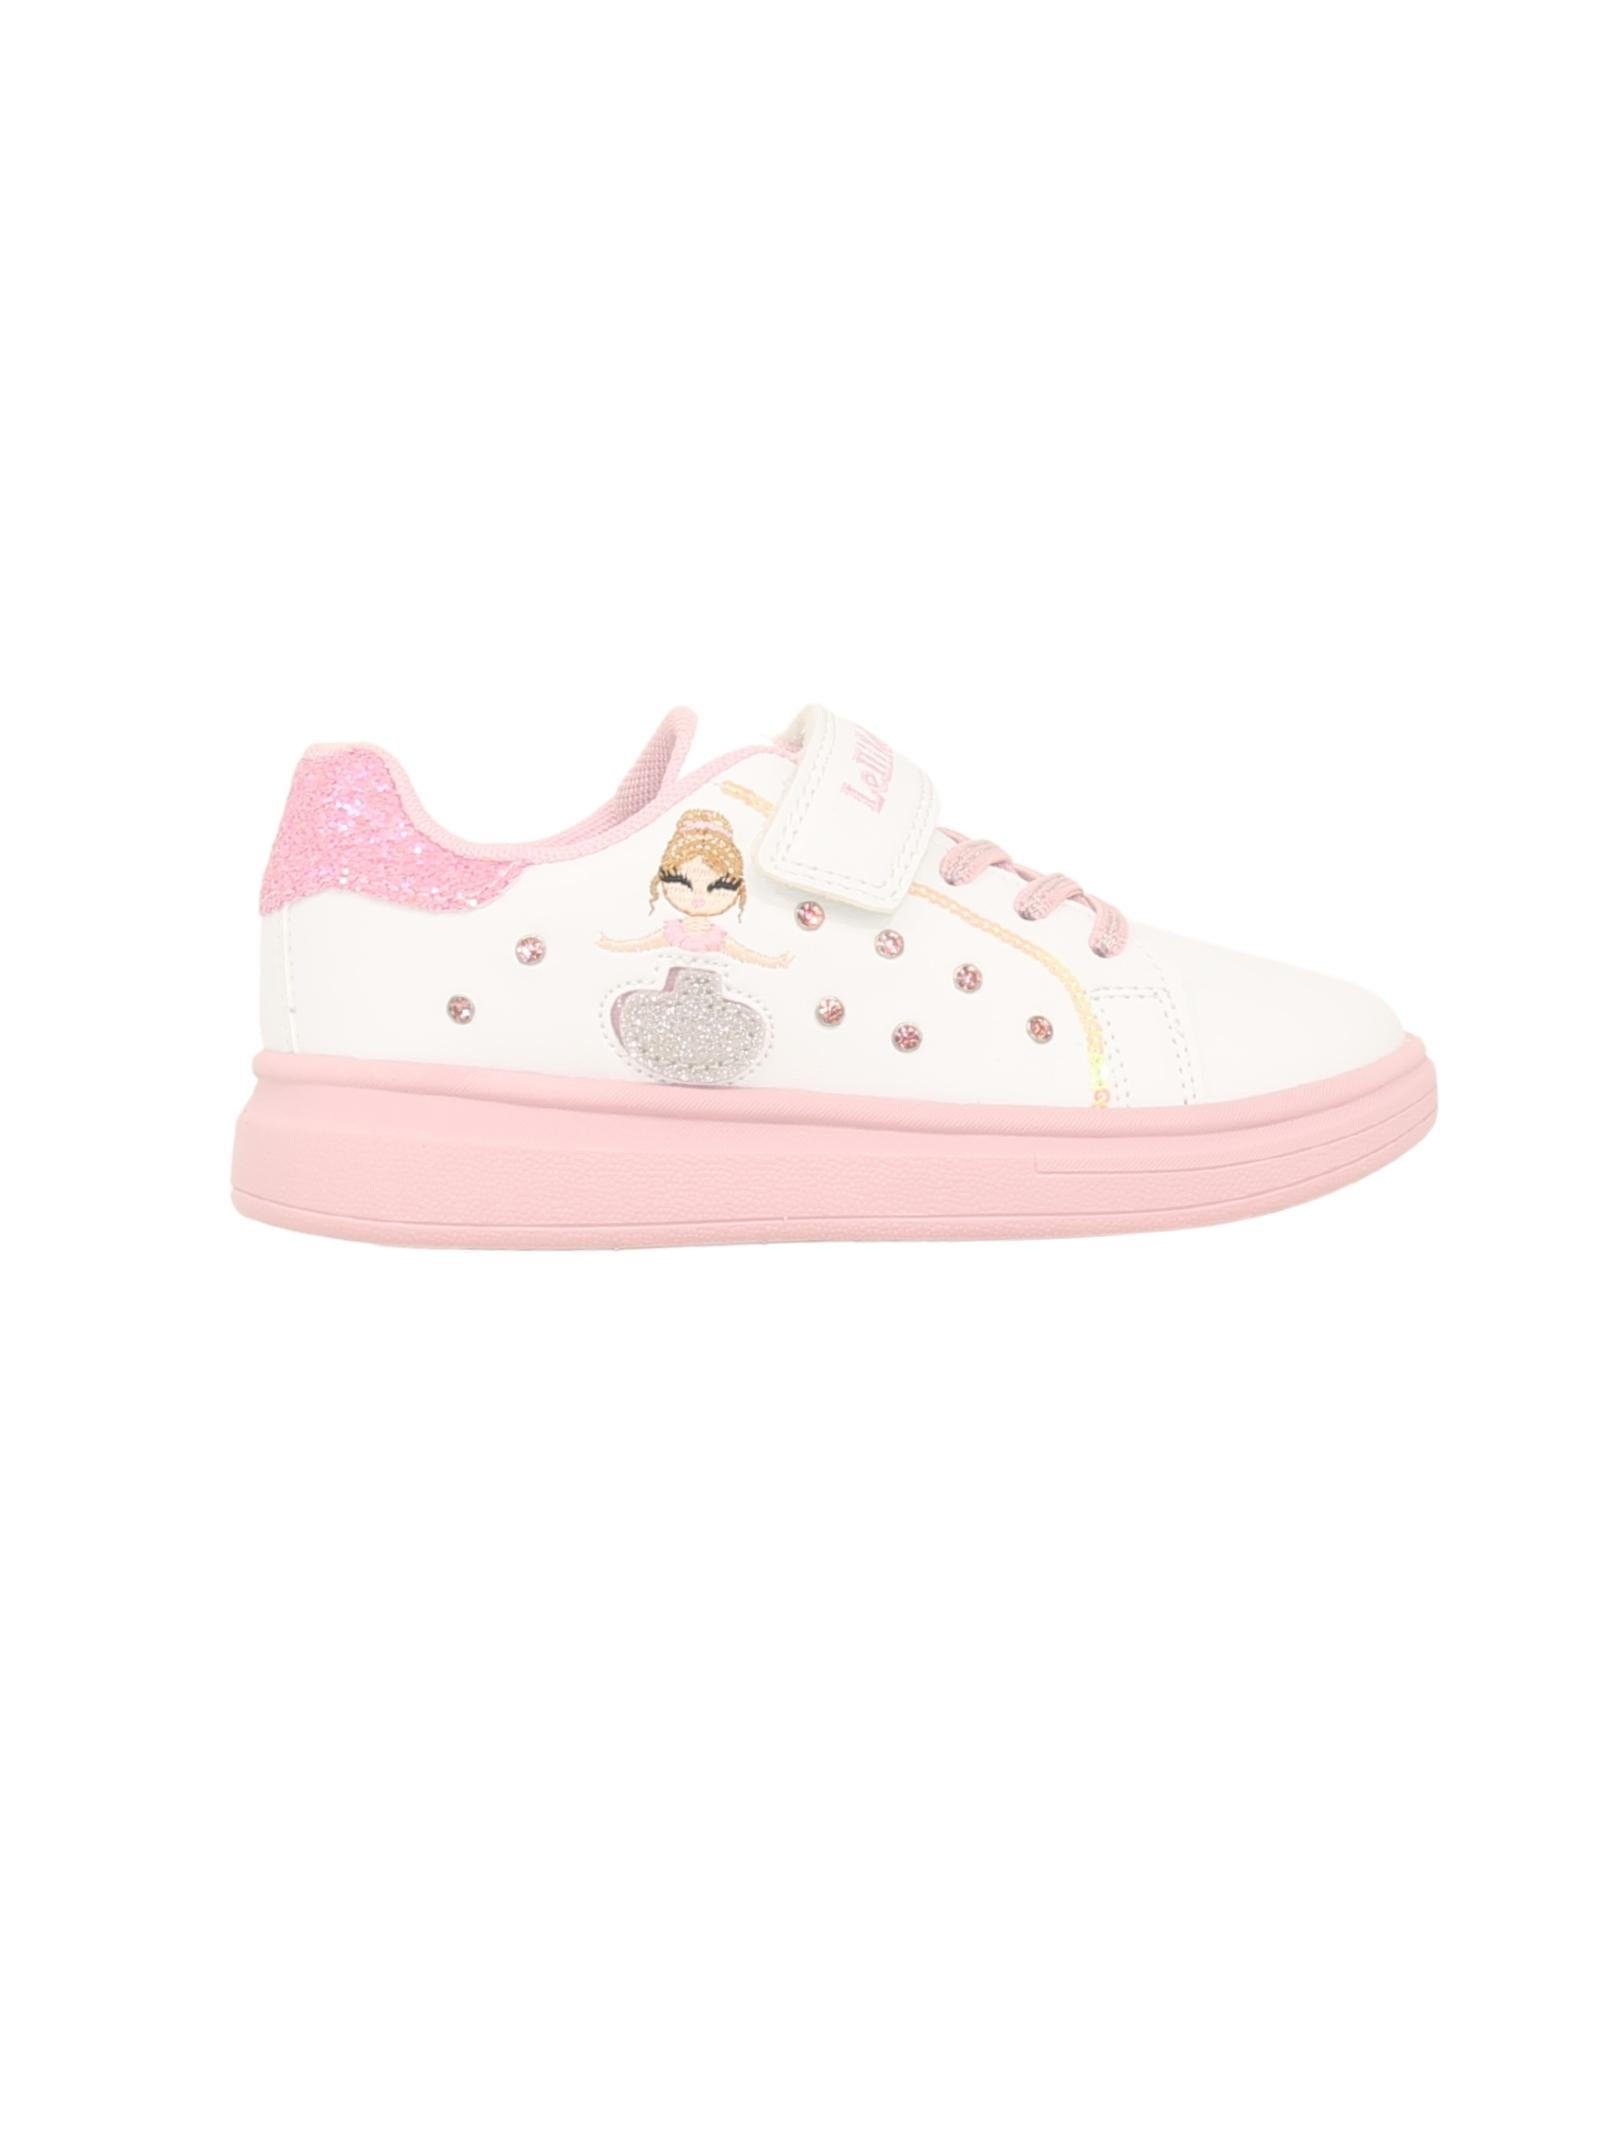 Sneakers Brillantini Bambina LELLI KELLY | Sneakers | LK4826BIANCO/ROSA